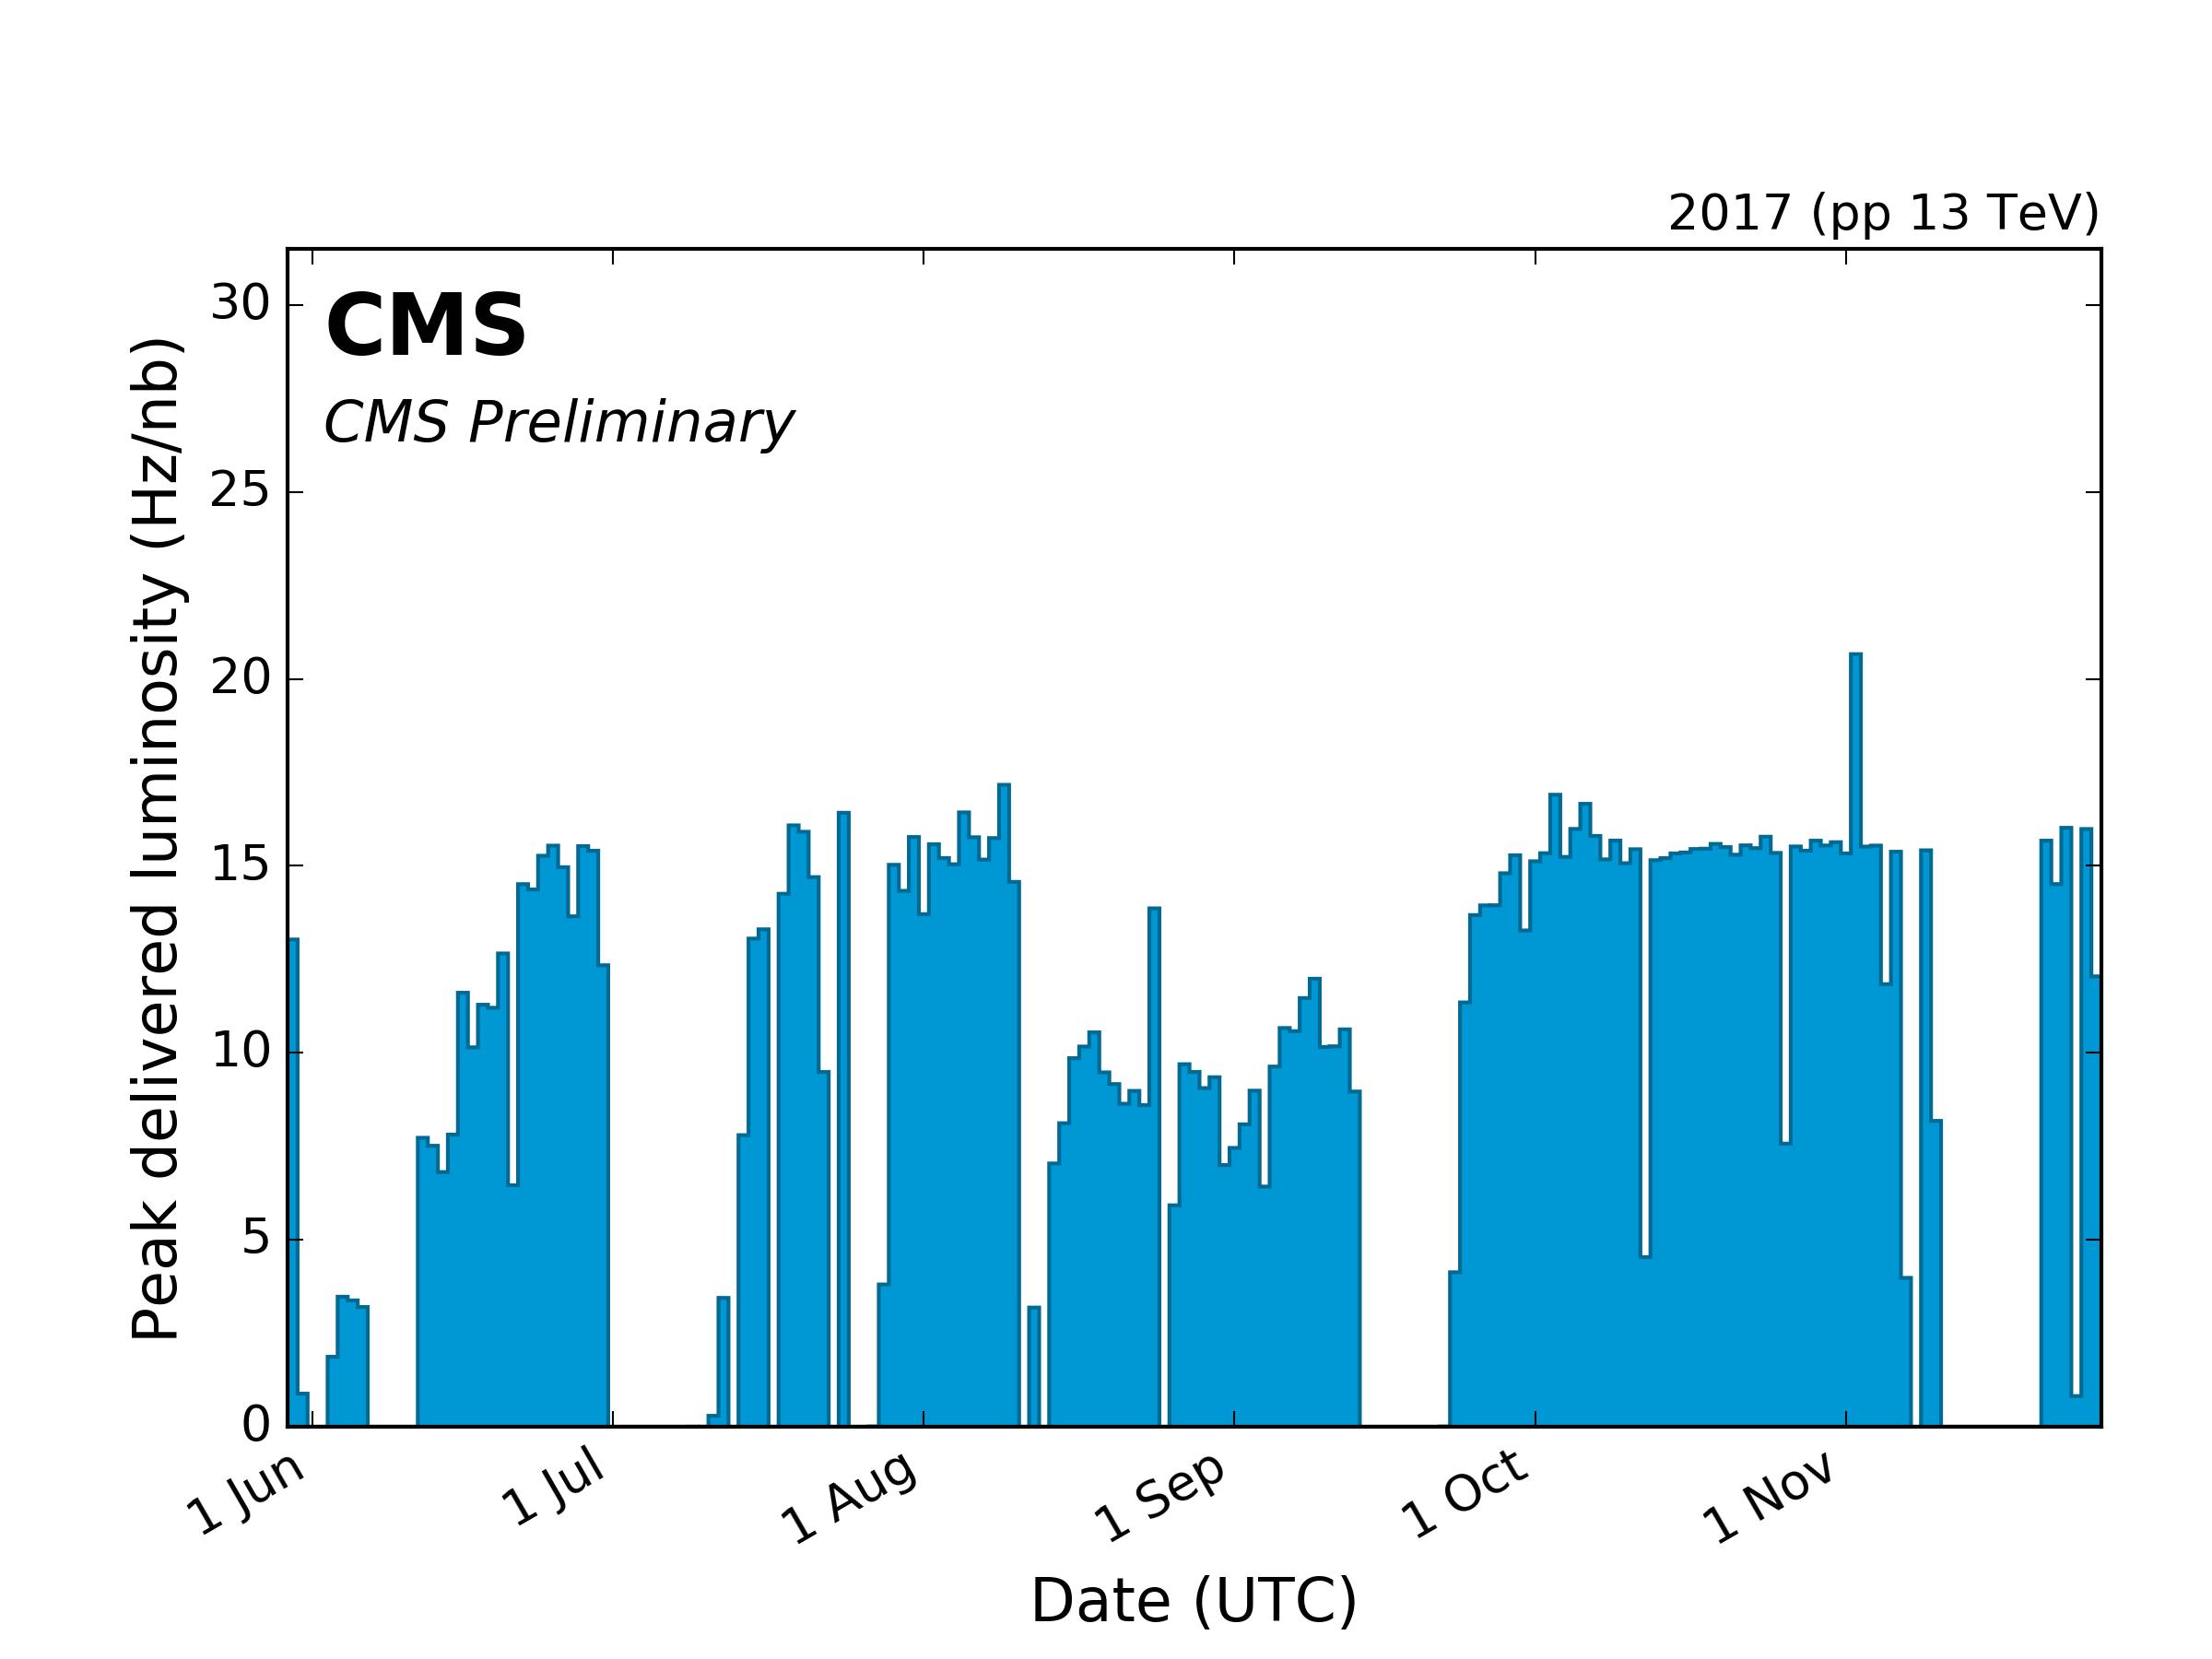 https://cern.ch/cmslumi/publicplots/peak_lumi_per_day_pp_2017NormtagLumi.png